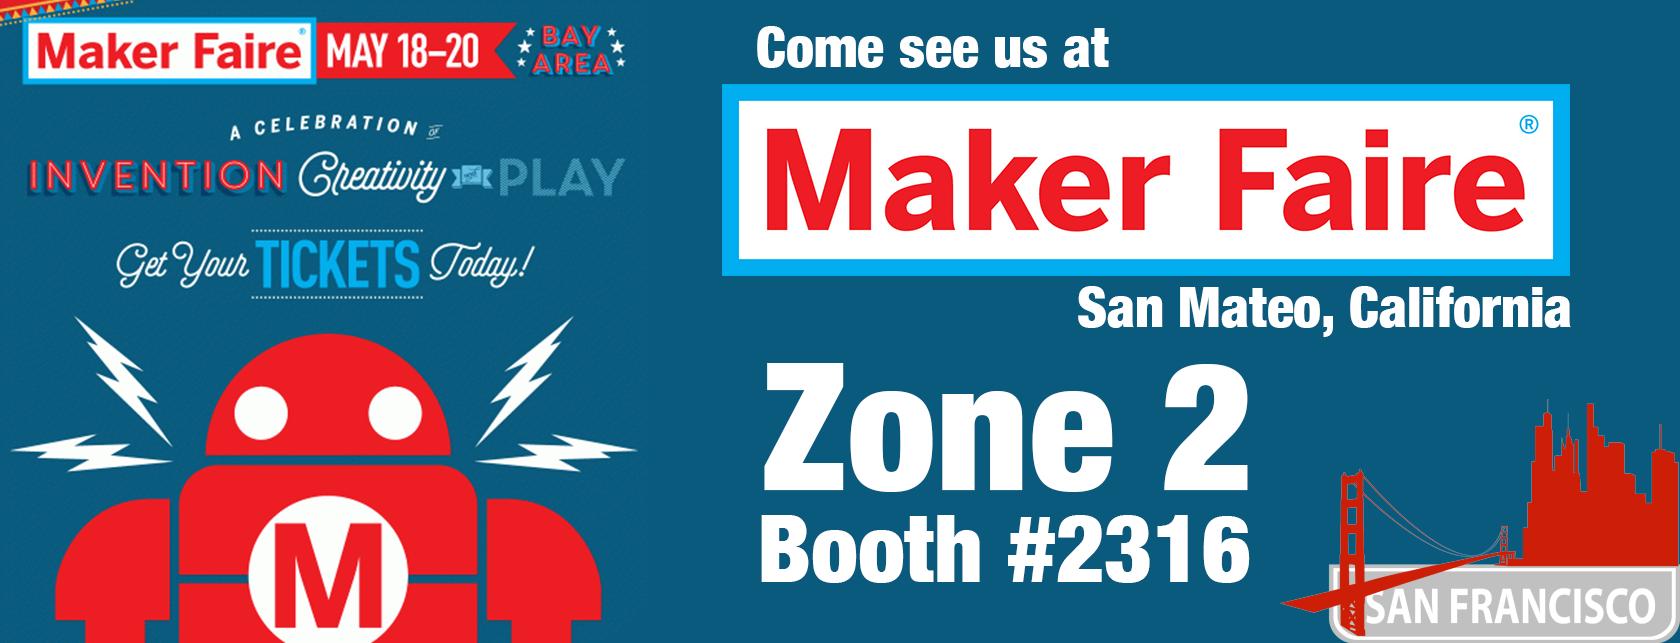 Laser Talk Guys Head To Maker Faire, Bay Area